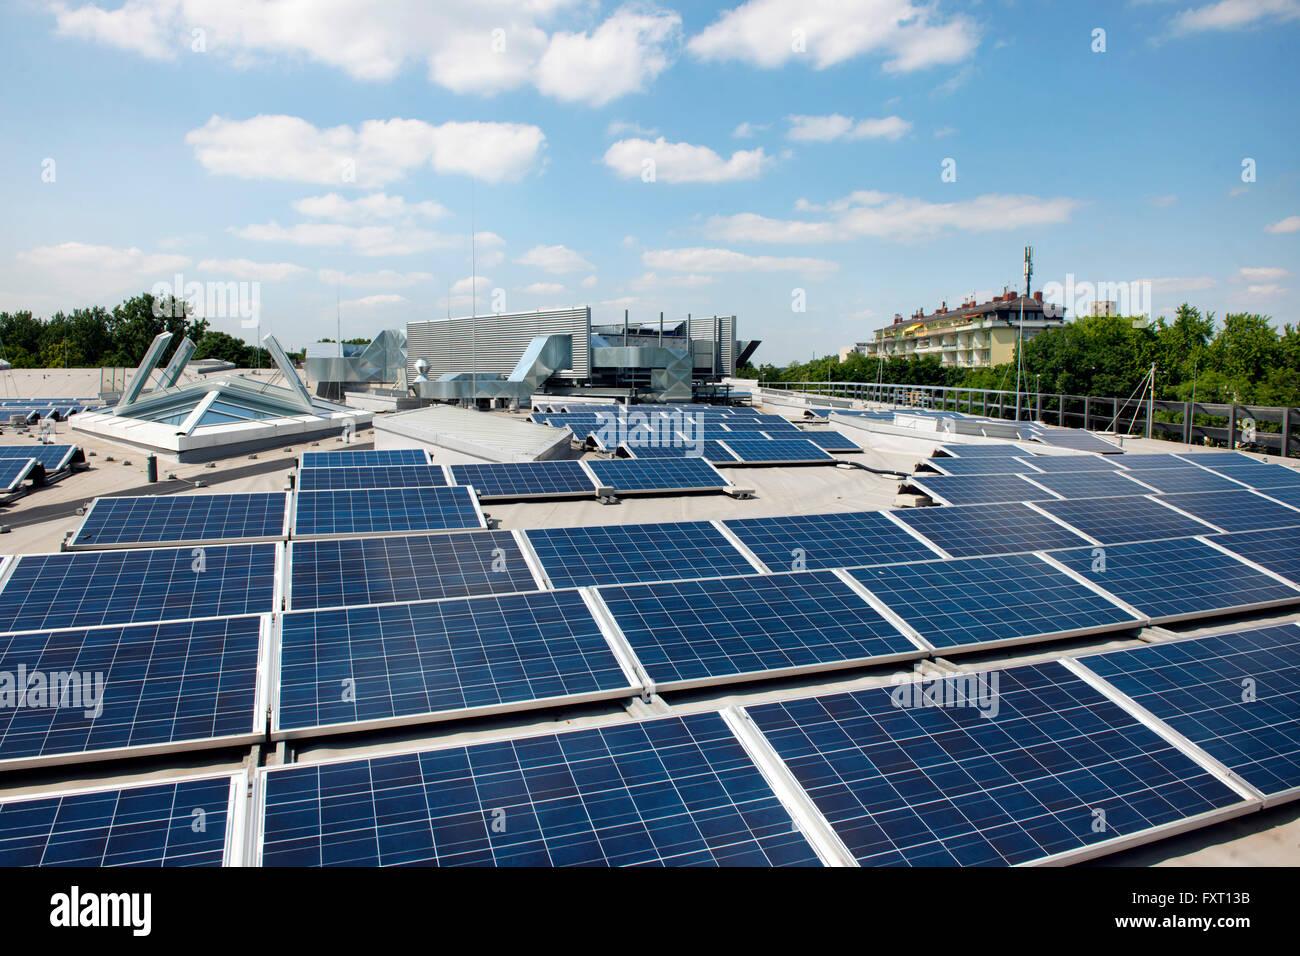 Solaranlagen Köln köln neustadt nord lentpark solaranlagen auf dem dach stock photo